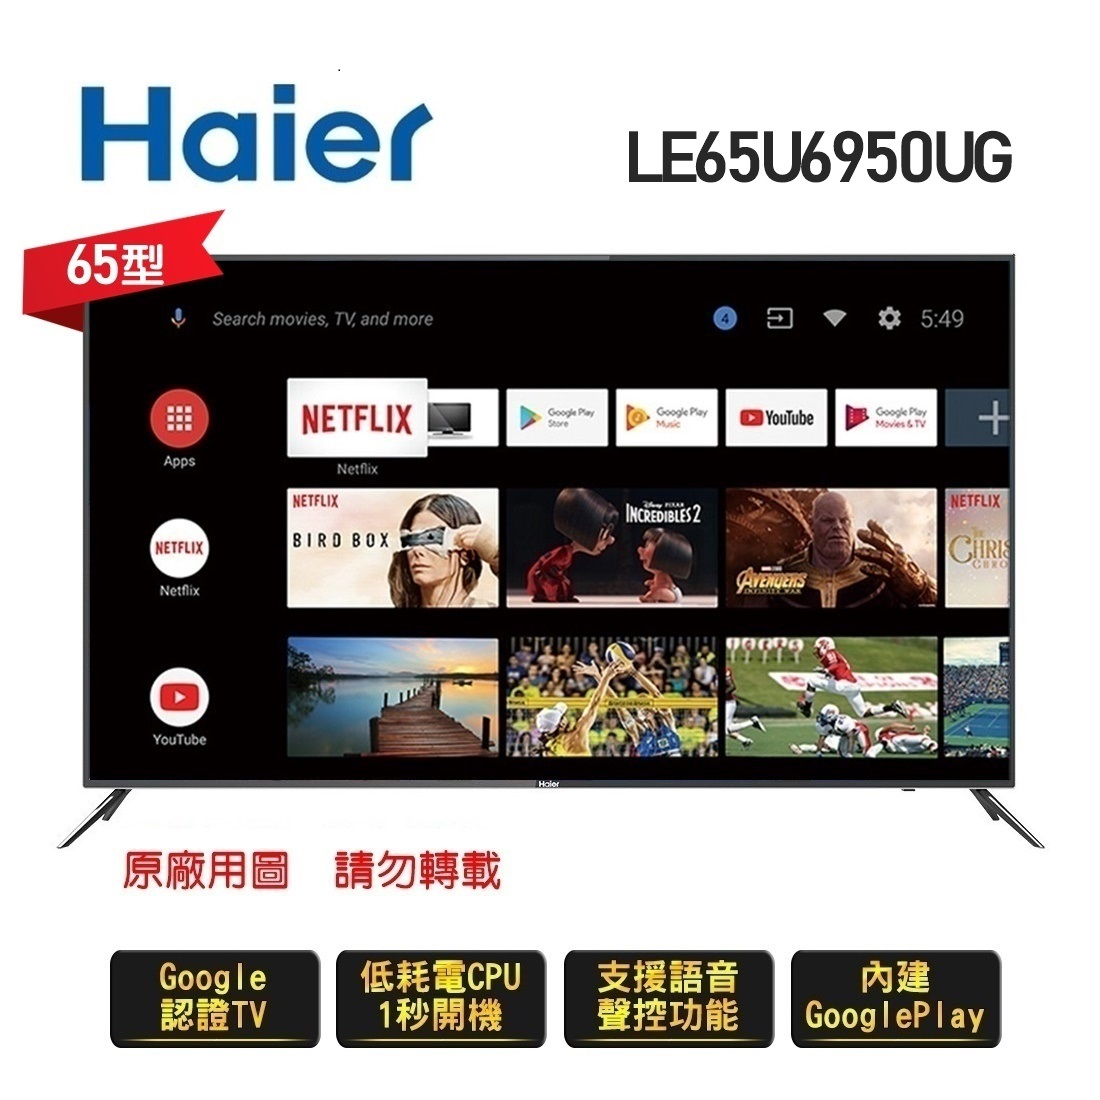 ★送基本安裝★加碼送海爾20L微電腦微波爐 20PX98【Haier 海爾】65吋 真Android TV 4K HDR連網聲控液晶電視 LE65U6950UG